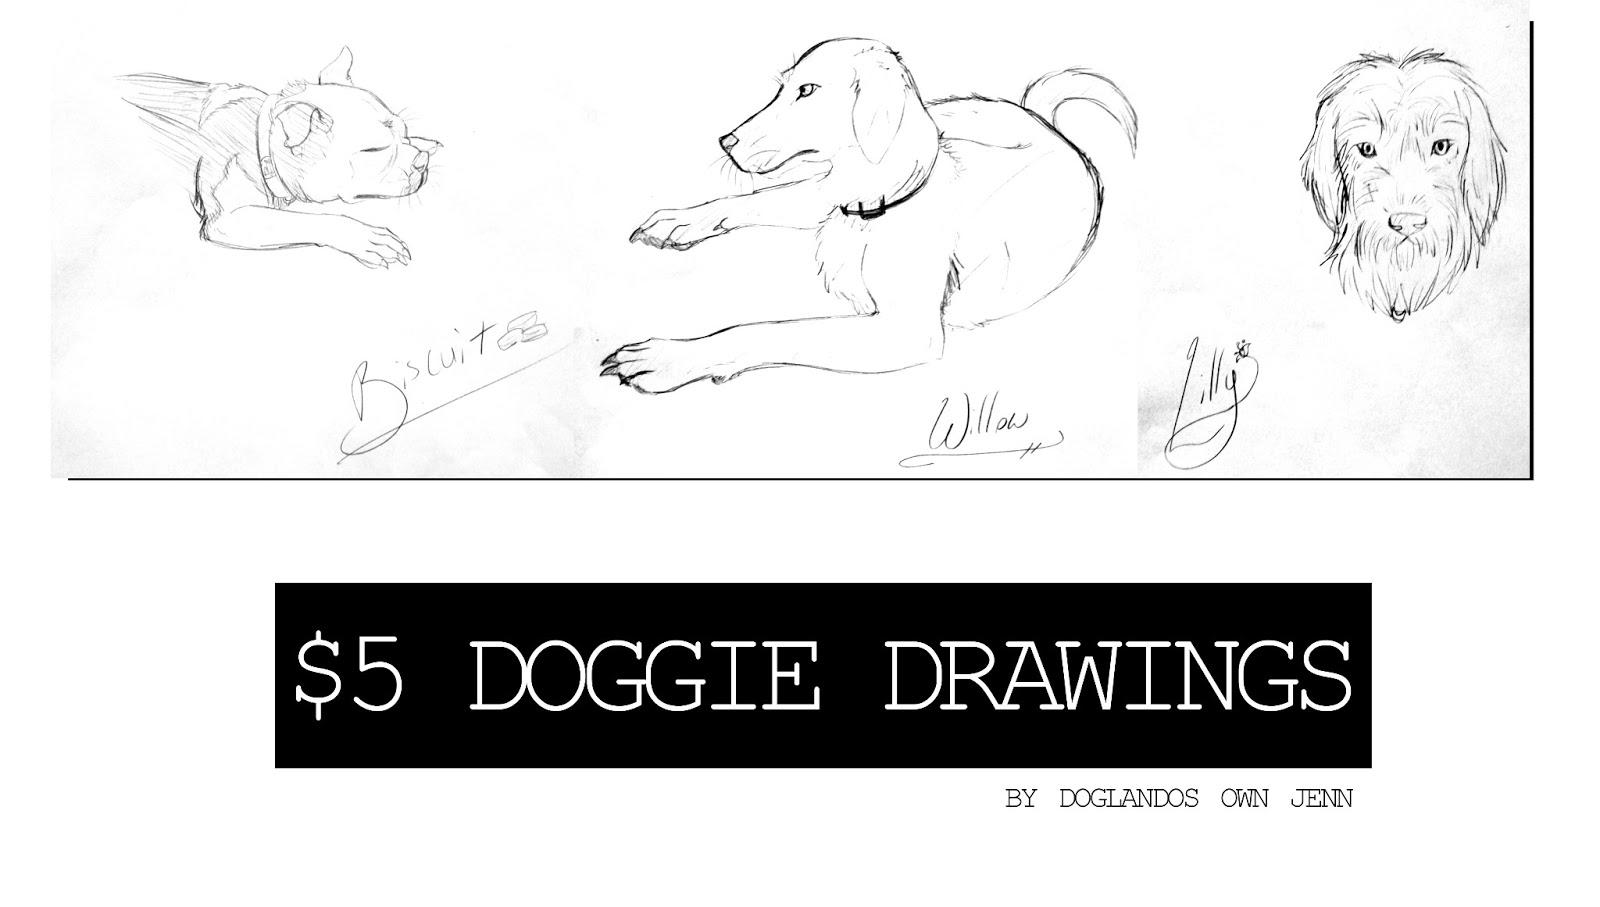 The Doglando Blog Orlando Dog Grooming